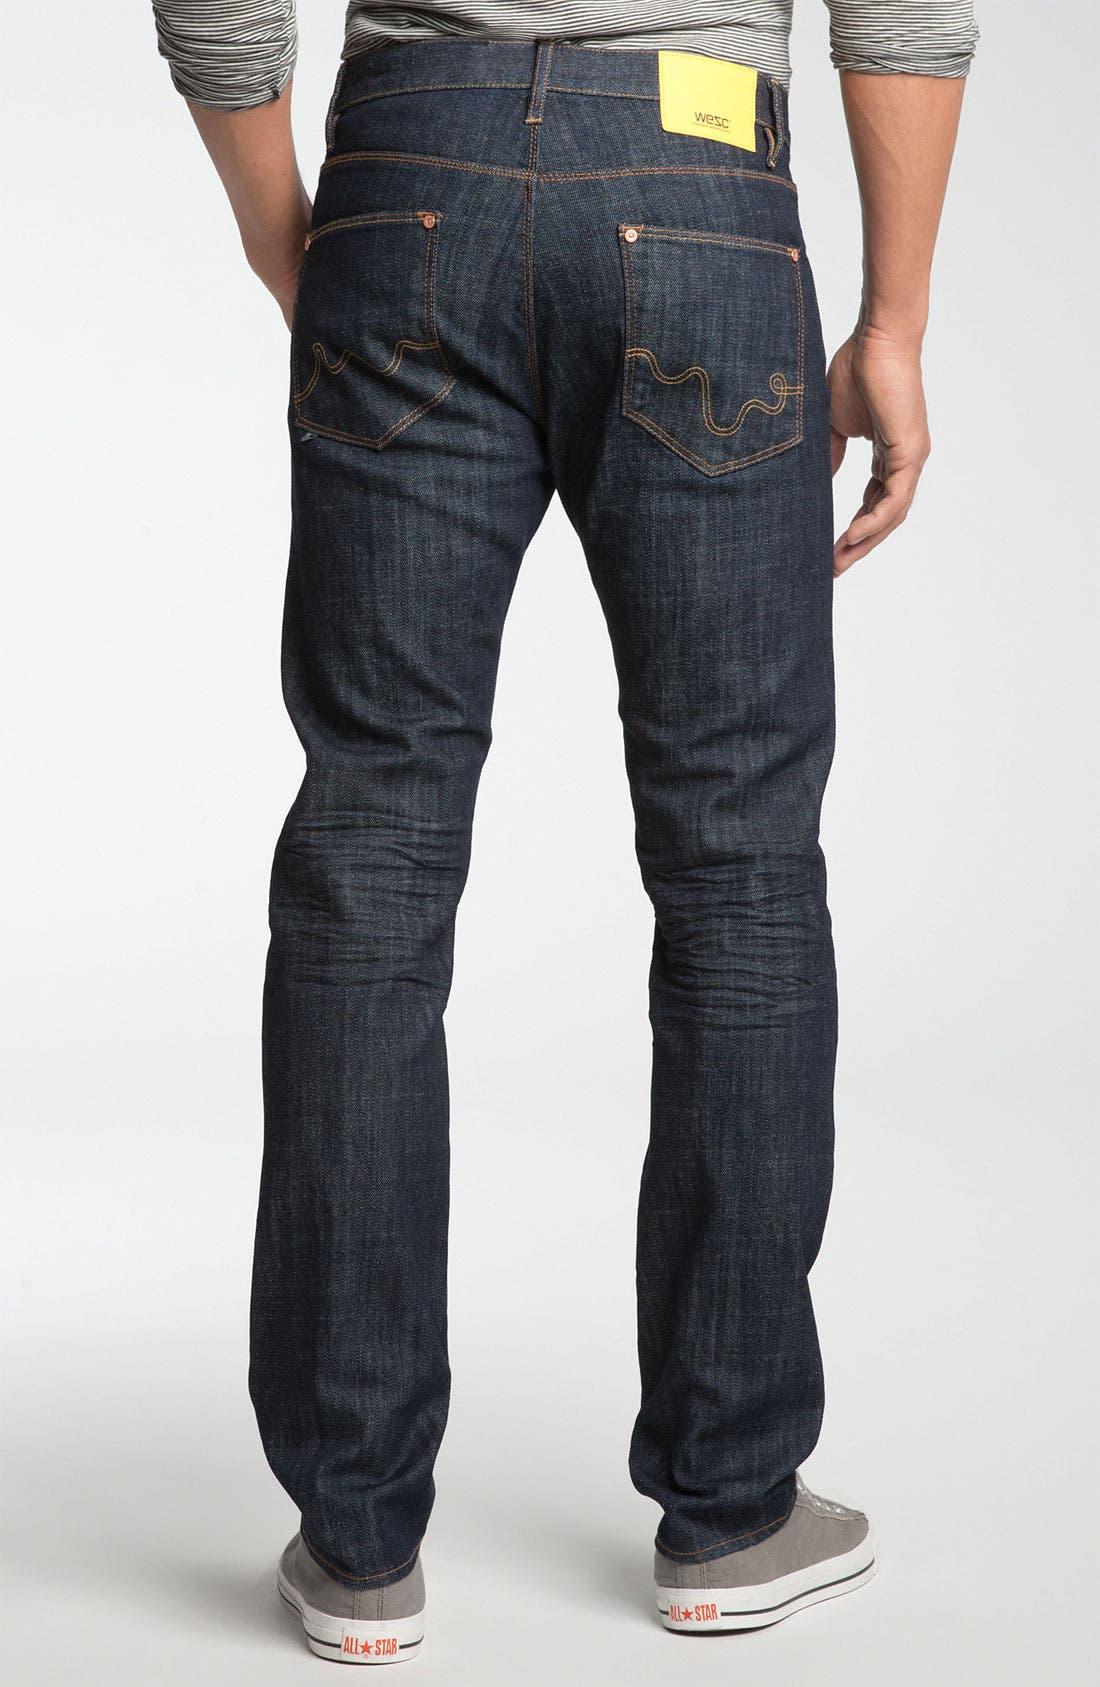 Alternate Image 1 Selected - WeSC 'Eddy' Slim Fit Jeans (Bright)